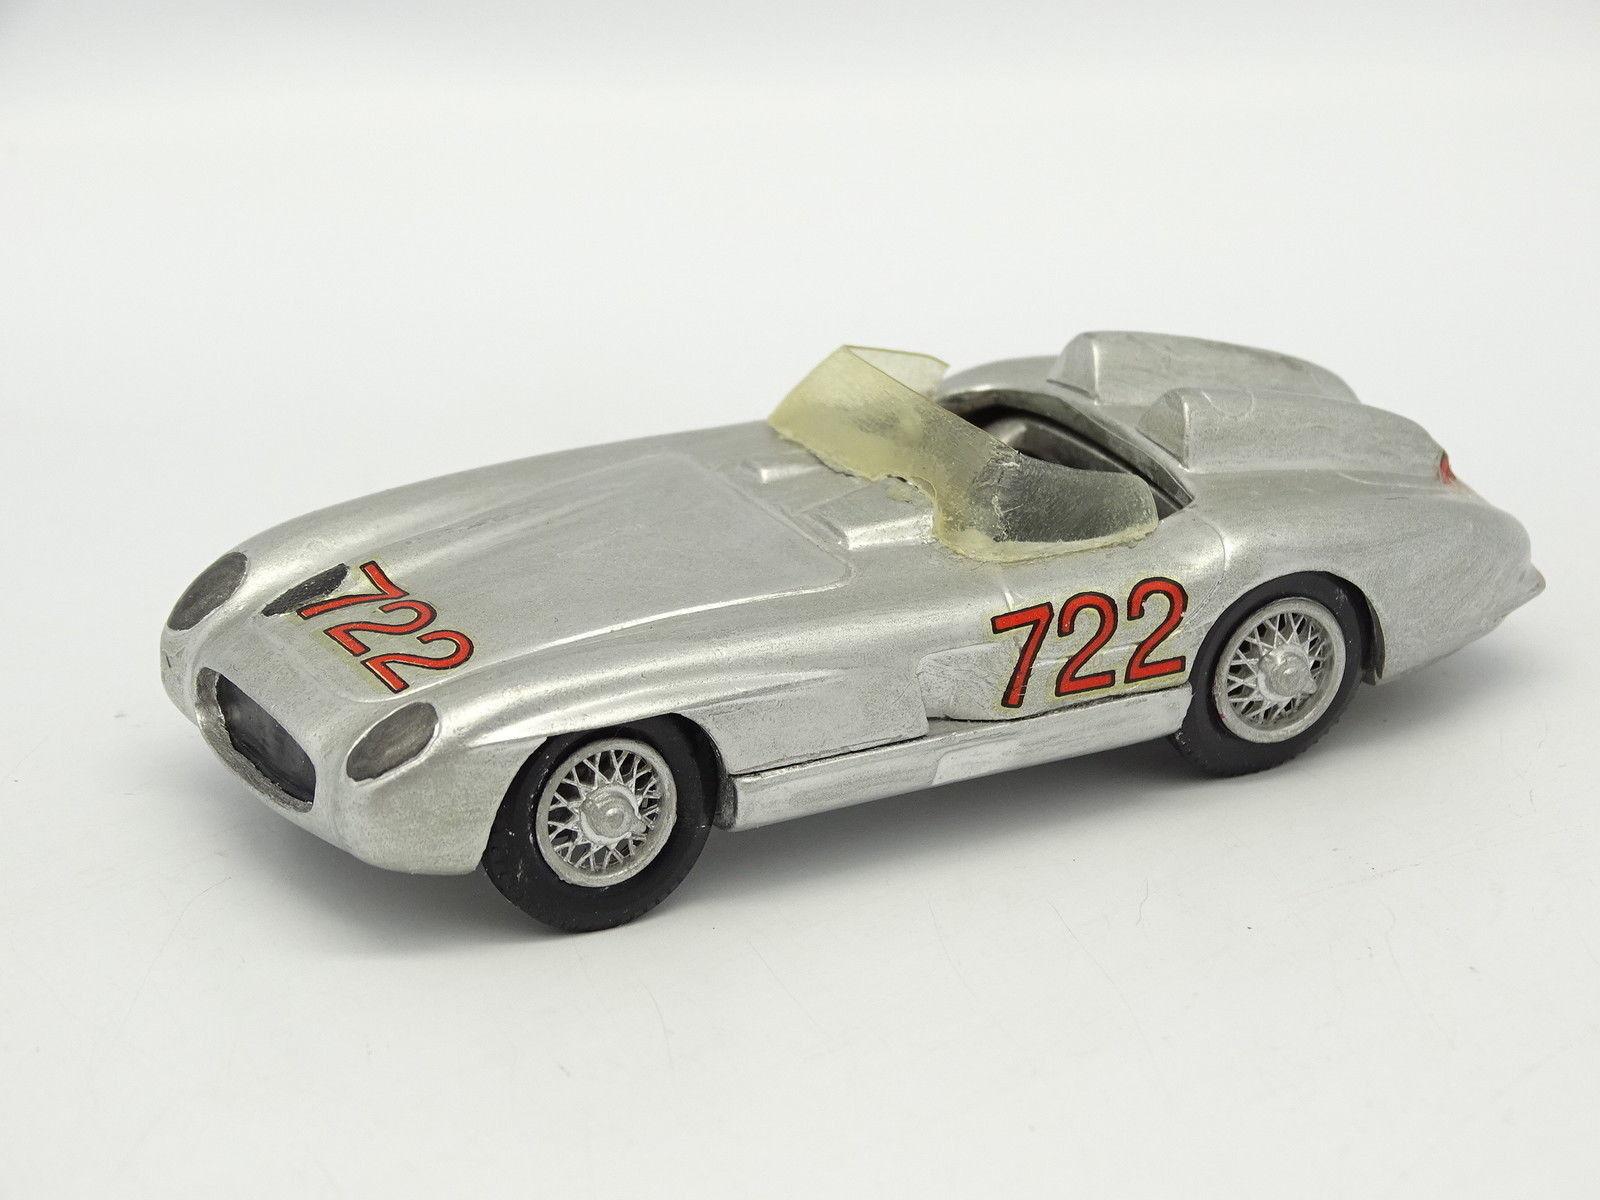 John day Set aufgebaut Metall 1 43 - MERCEDES 300 SLR Mille miglia 1955